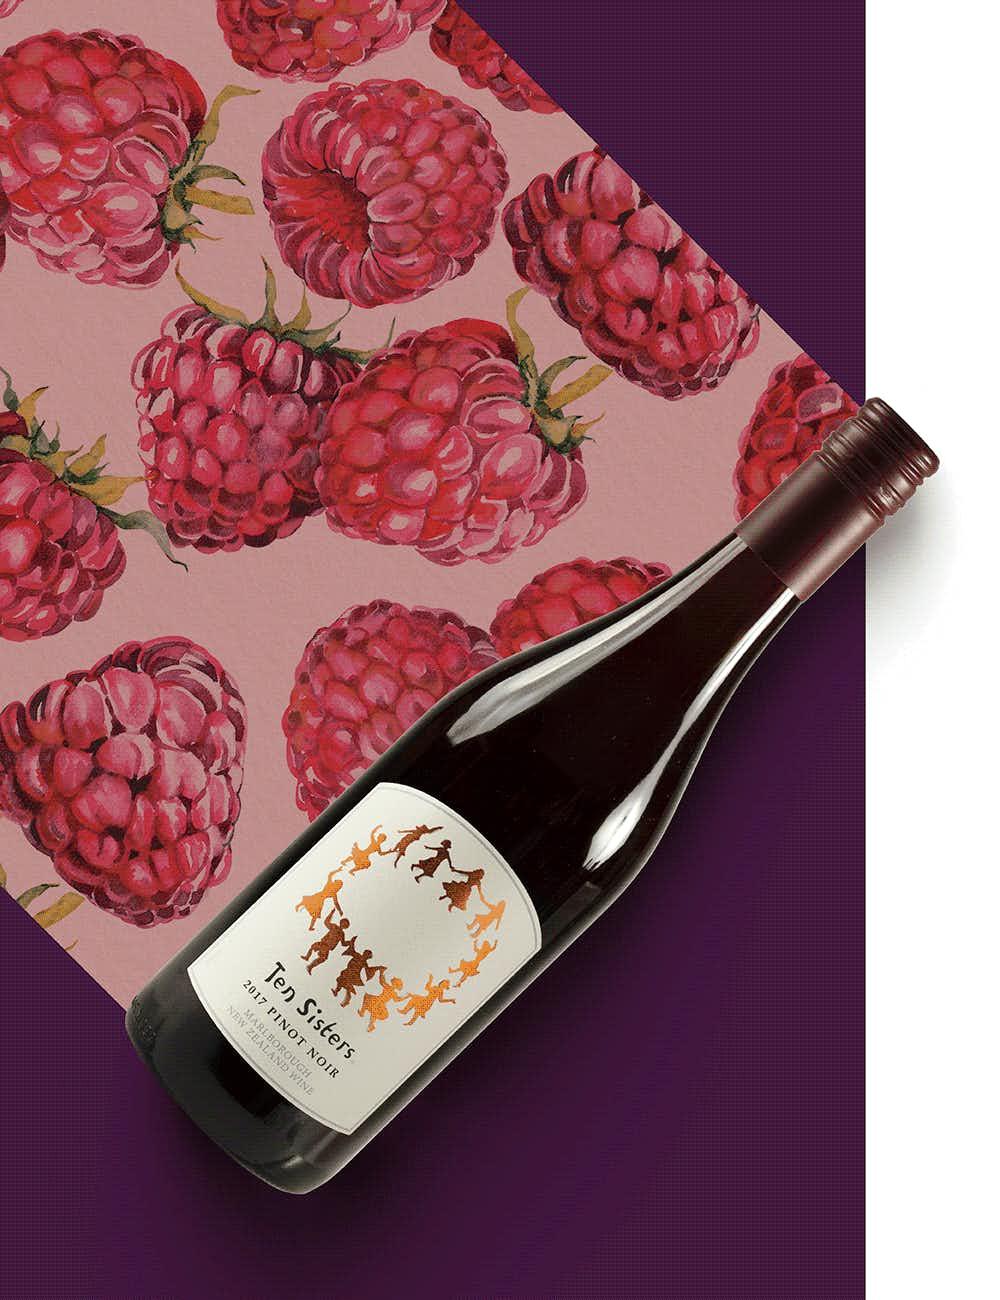 Ten Sisters Pinot Noir 2017